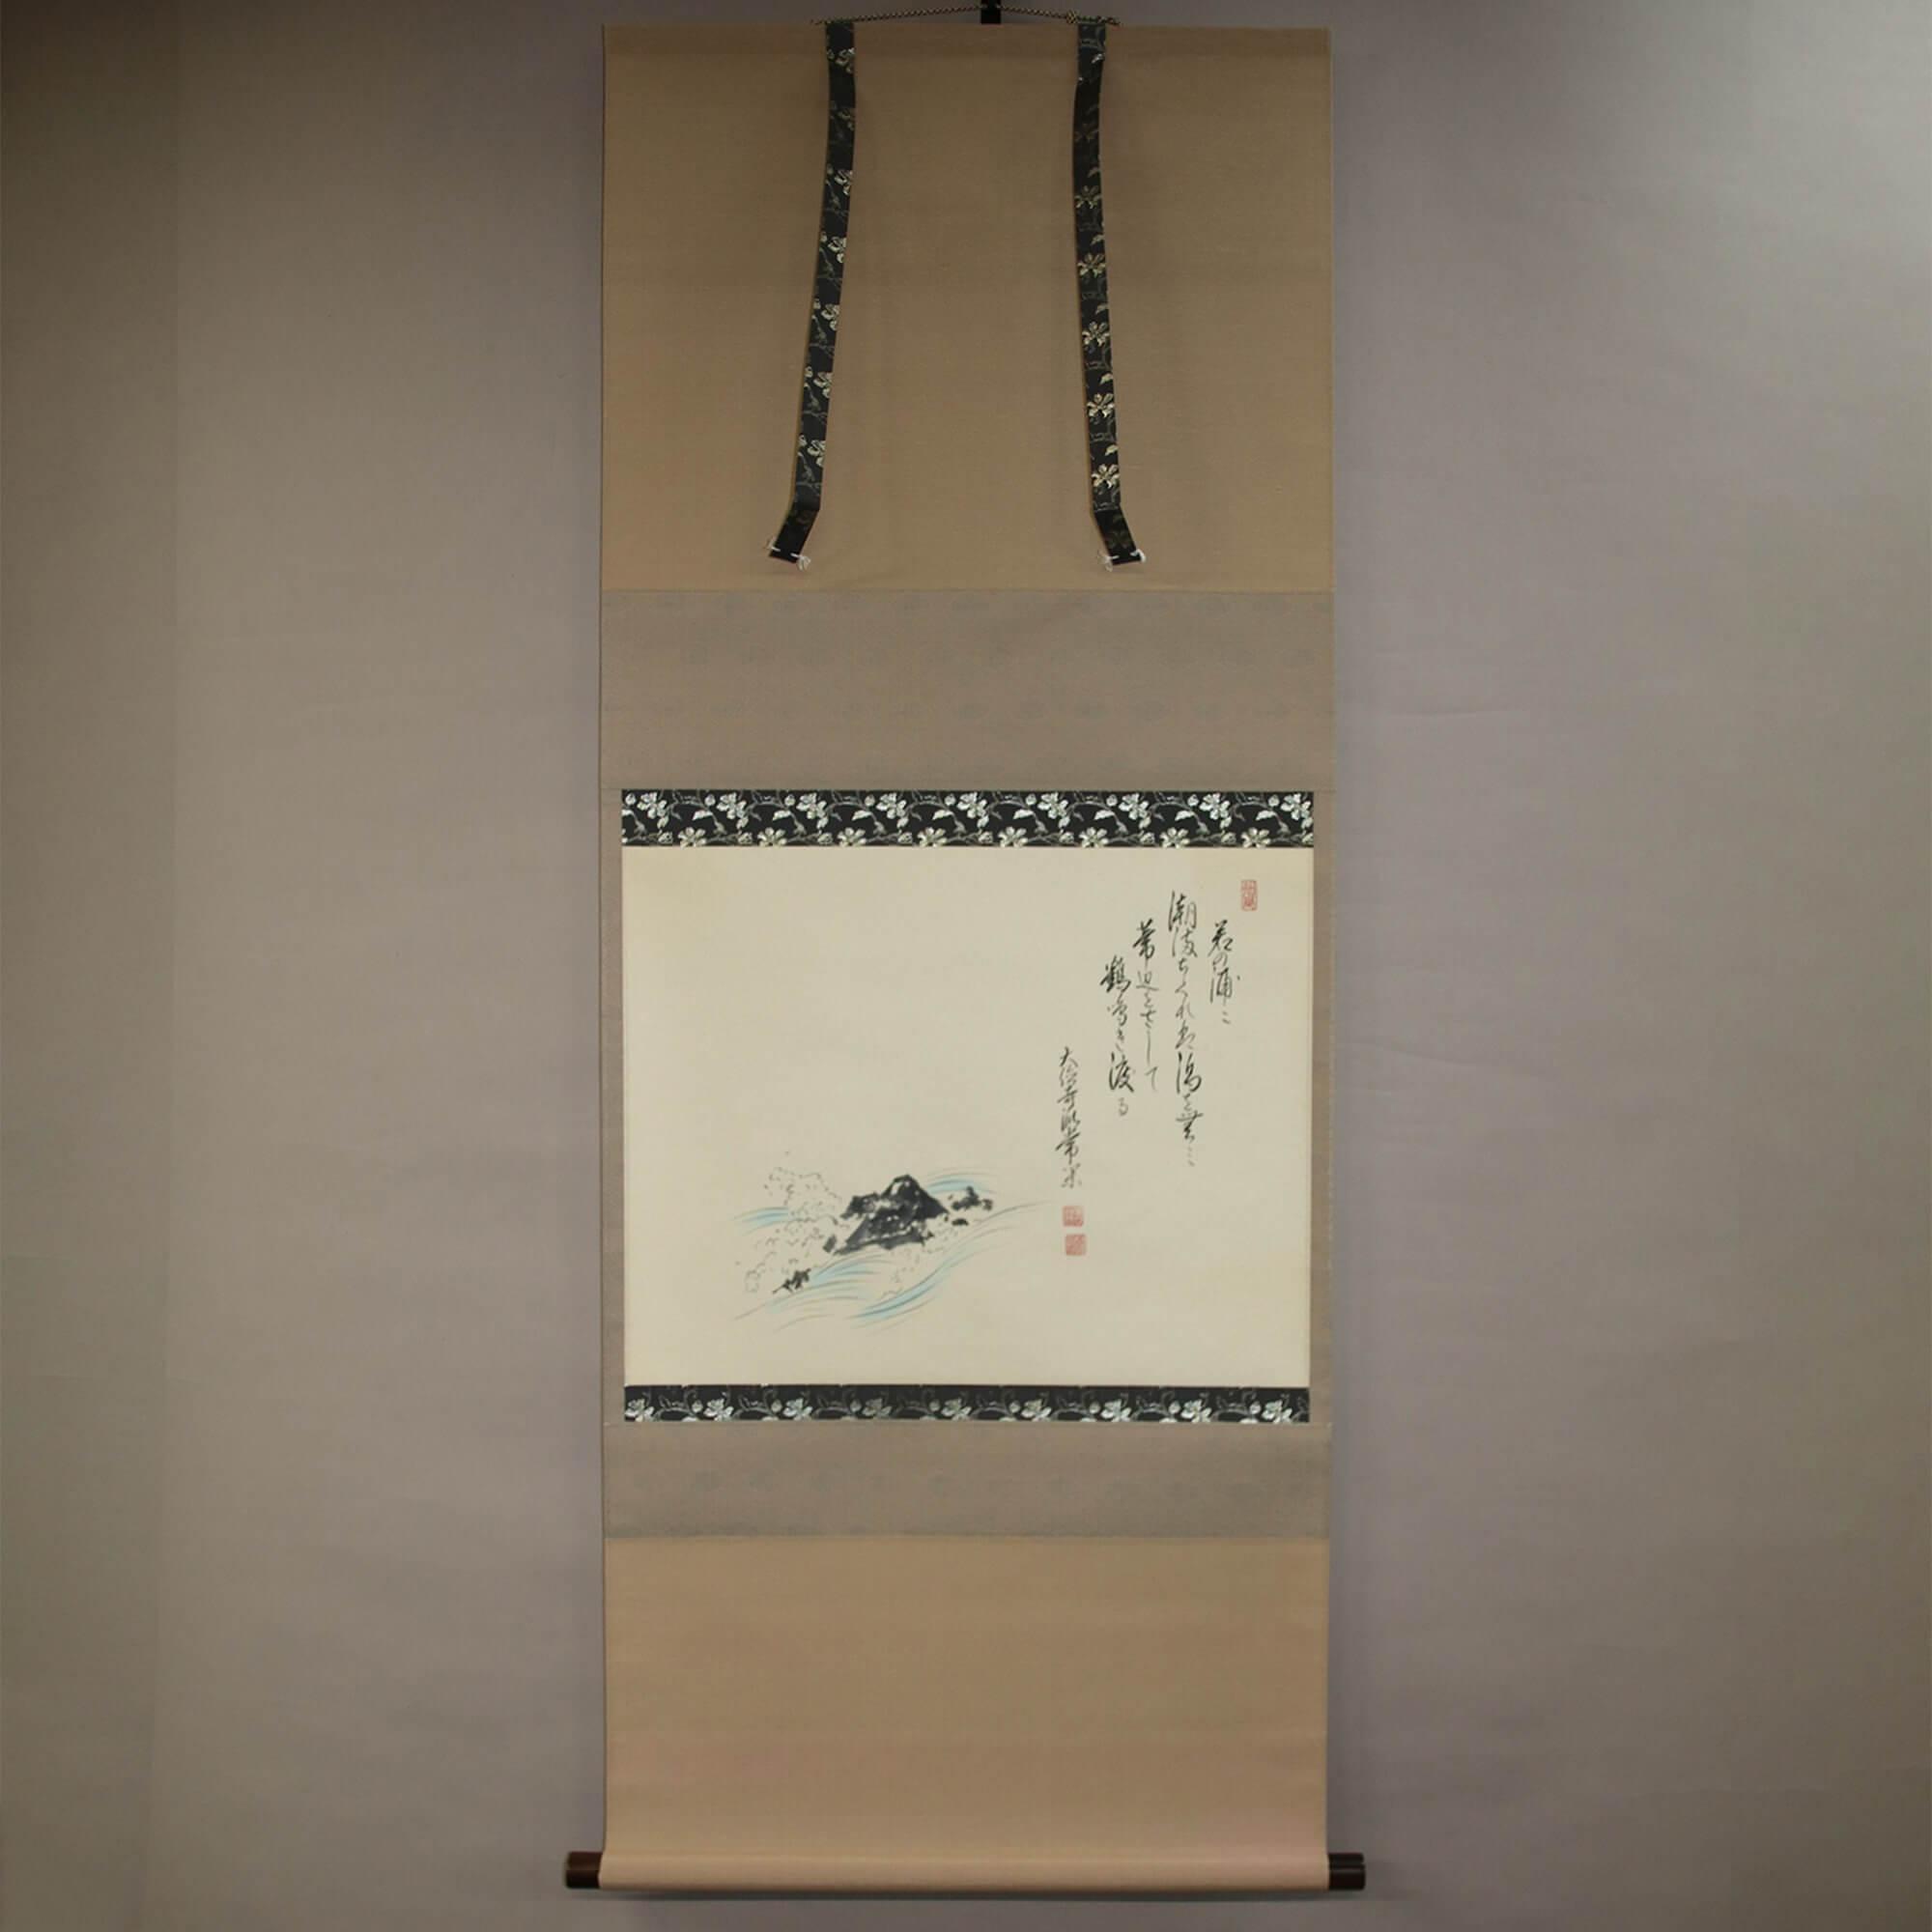 Calligraphy: High Tide / Tsuji Jōkan